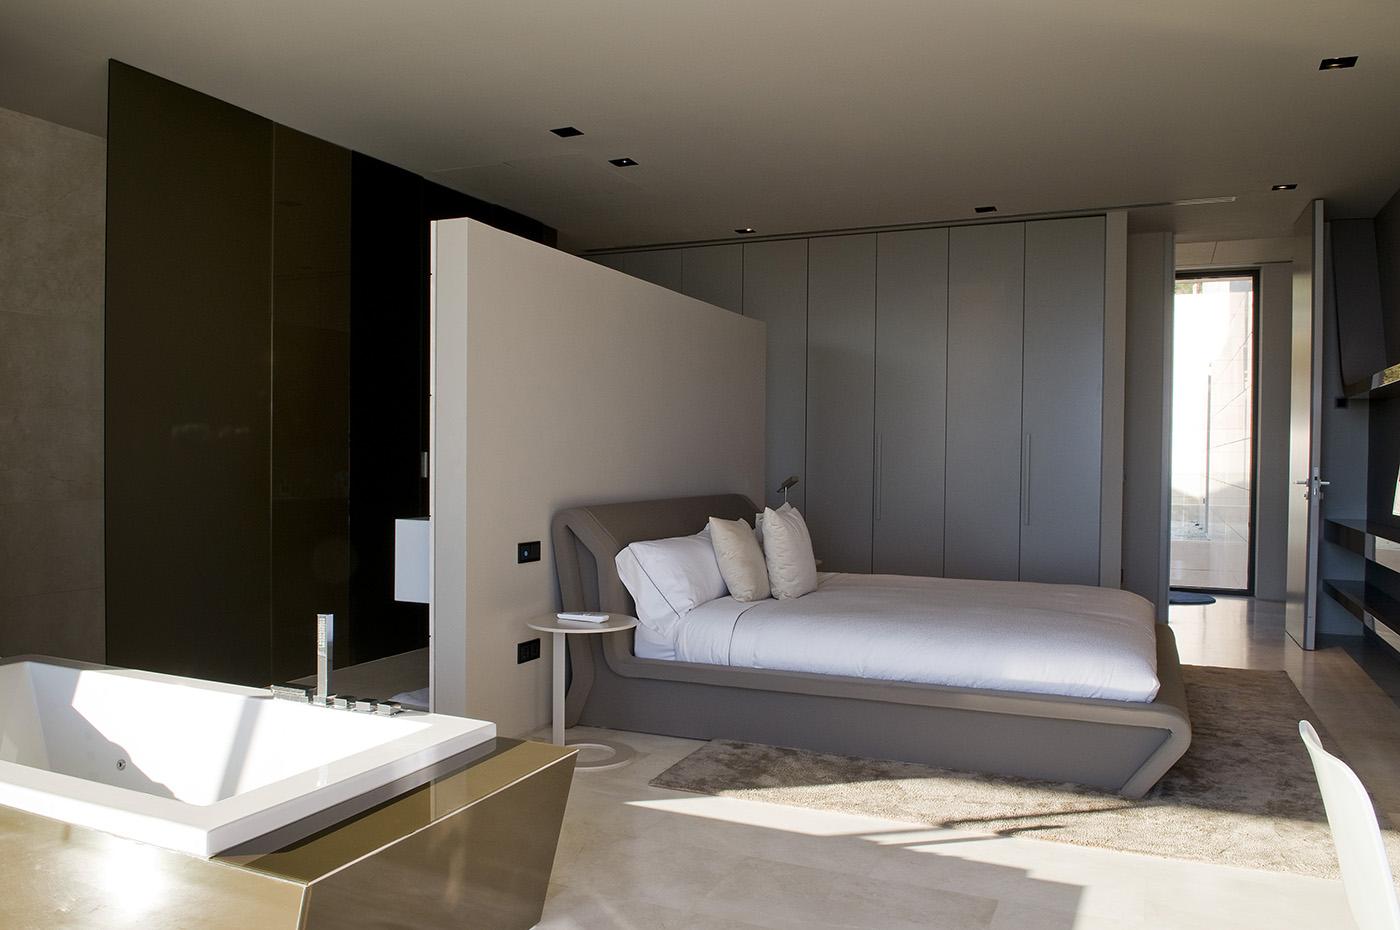 Vivienda unifamiliar en marbella por a cero casa minimalista - Programa diseno vivienda ...